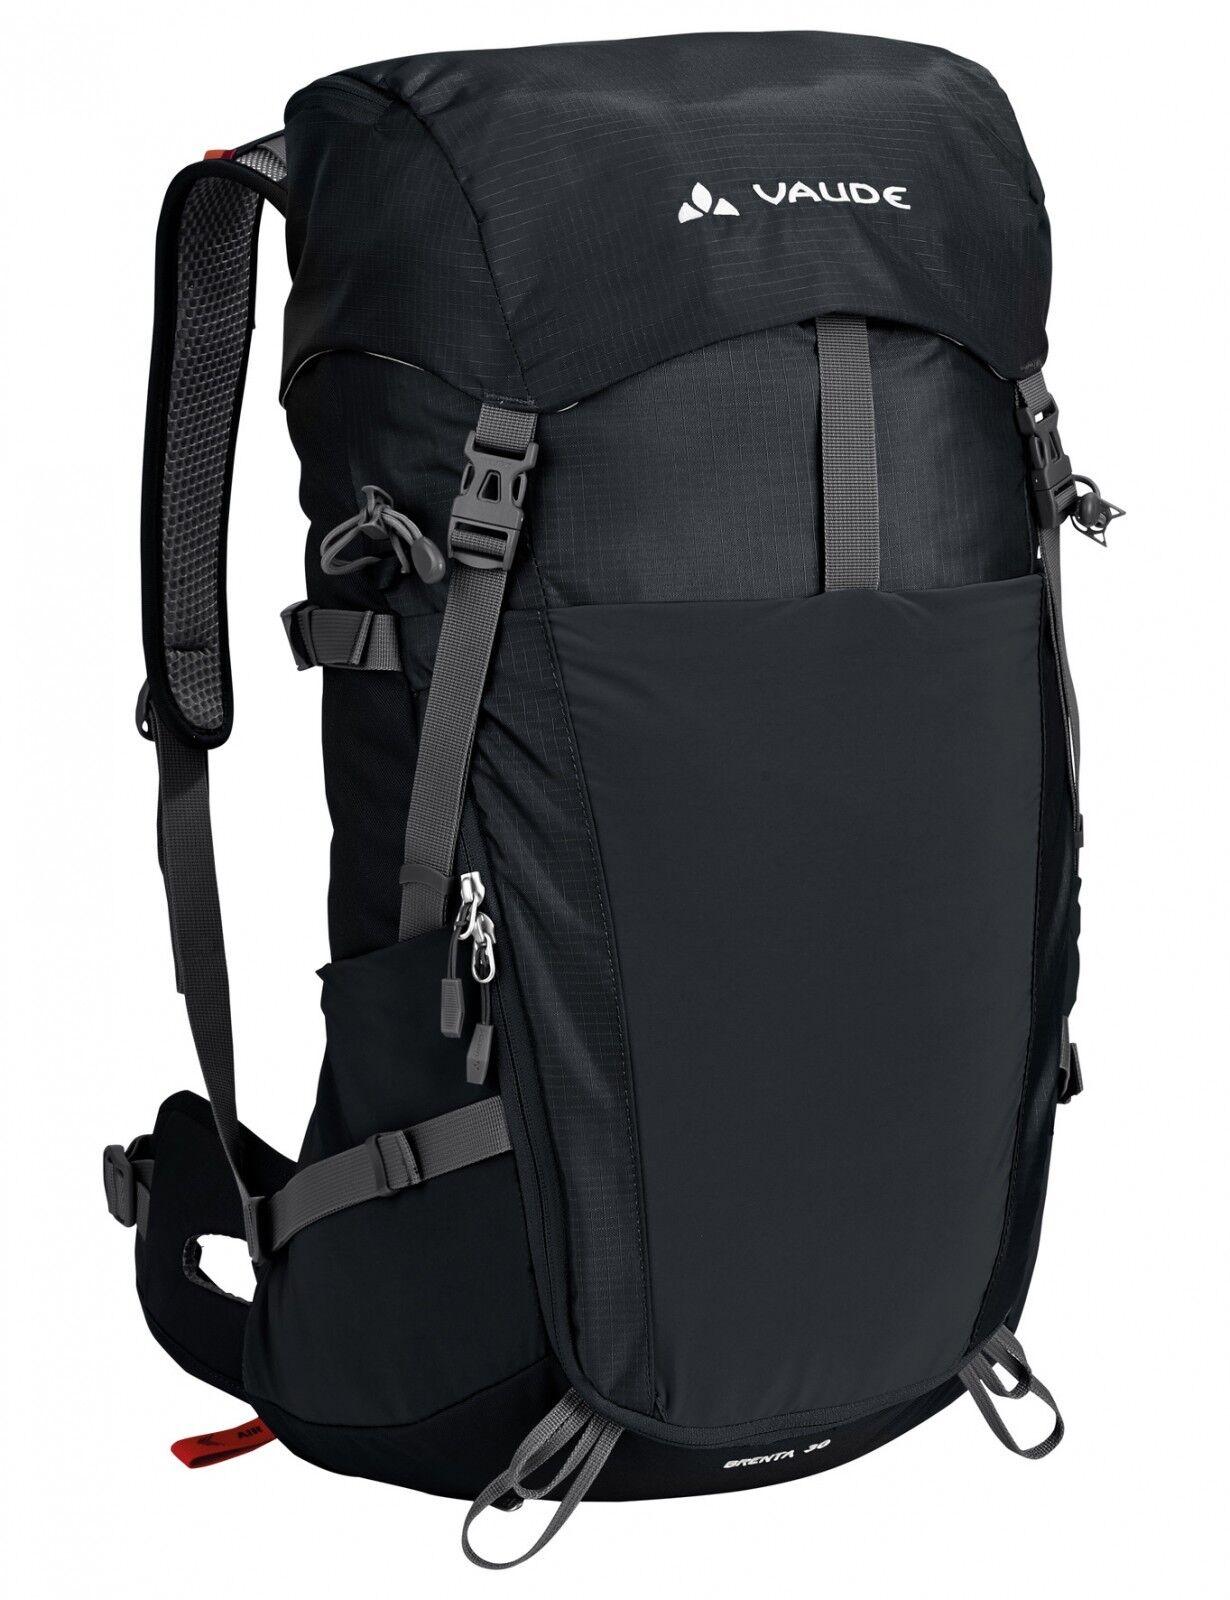 Vaude escursioni a piedi Trekking Expeditions Zaino reintroduzione 25 LITRI NERO